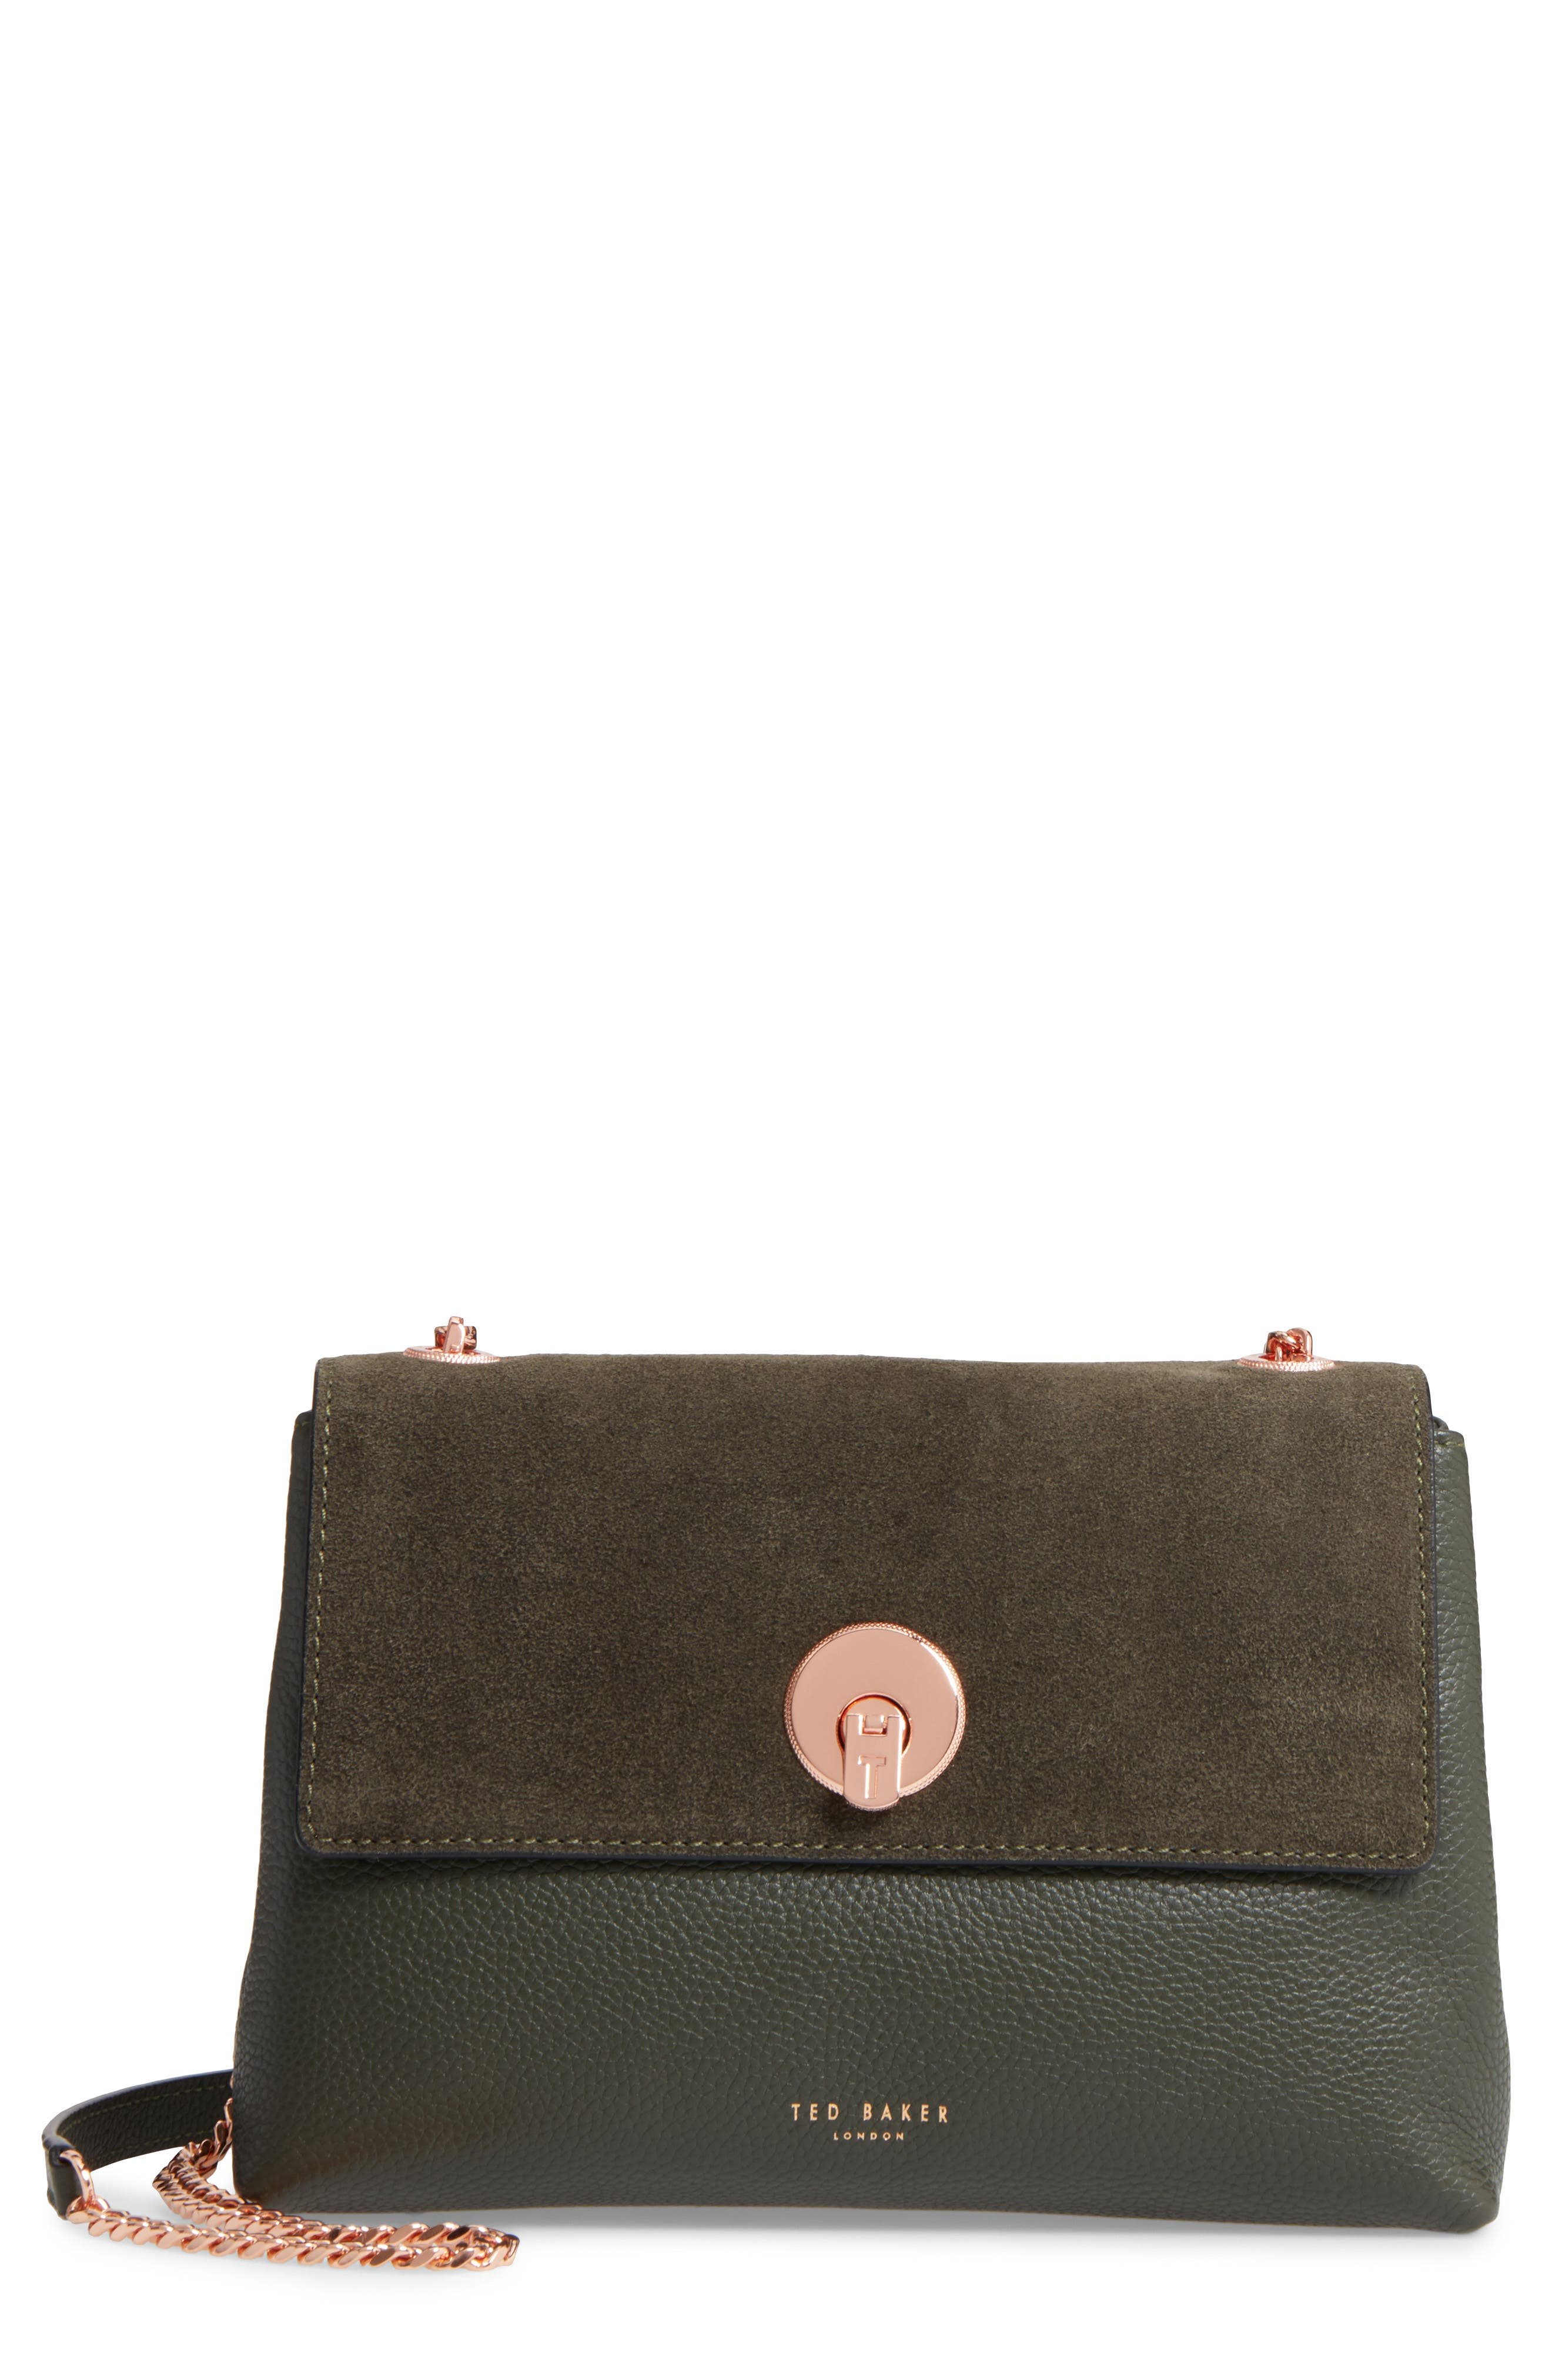 Sorikai Leather & Suede Crossbody Bag,                         Main,                         color, Khaki